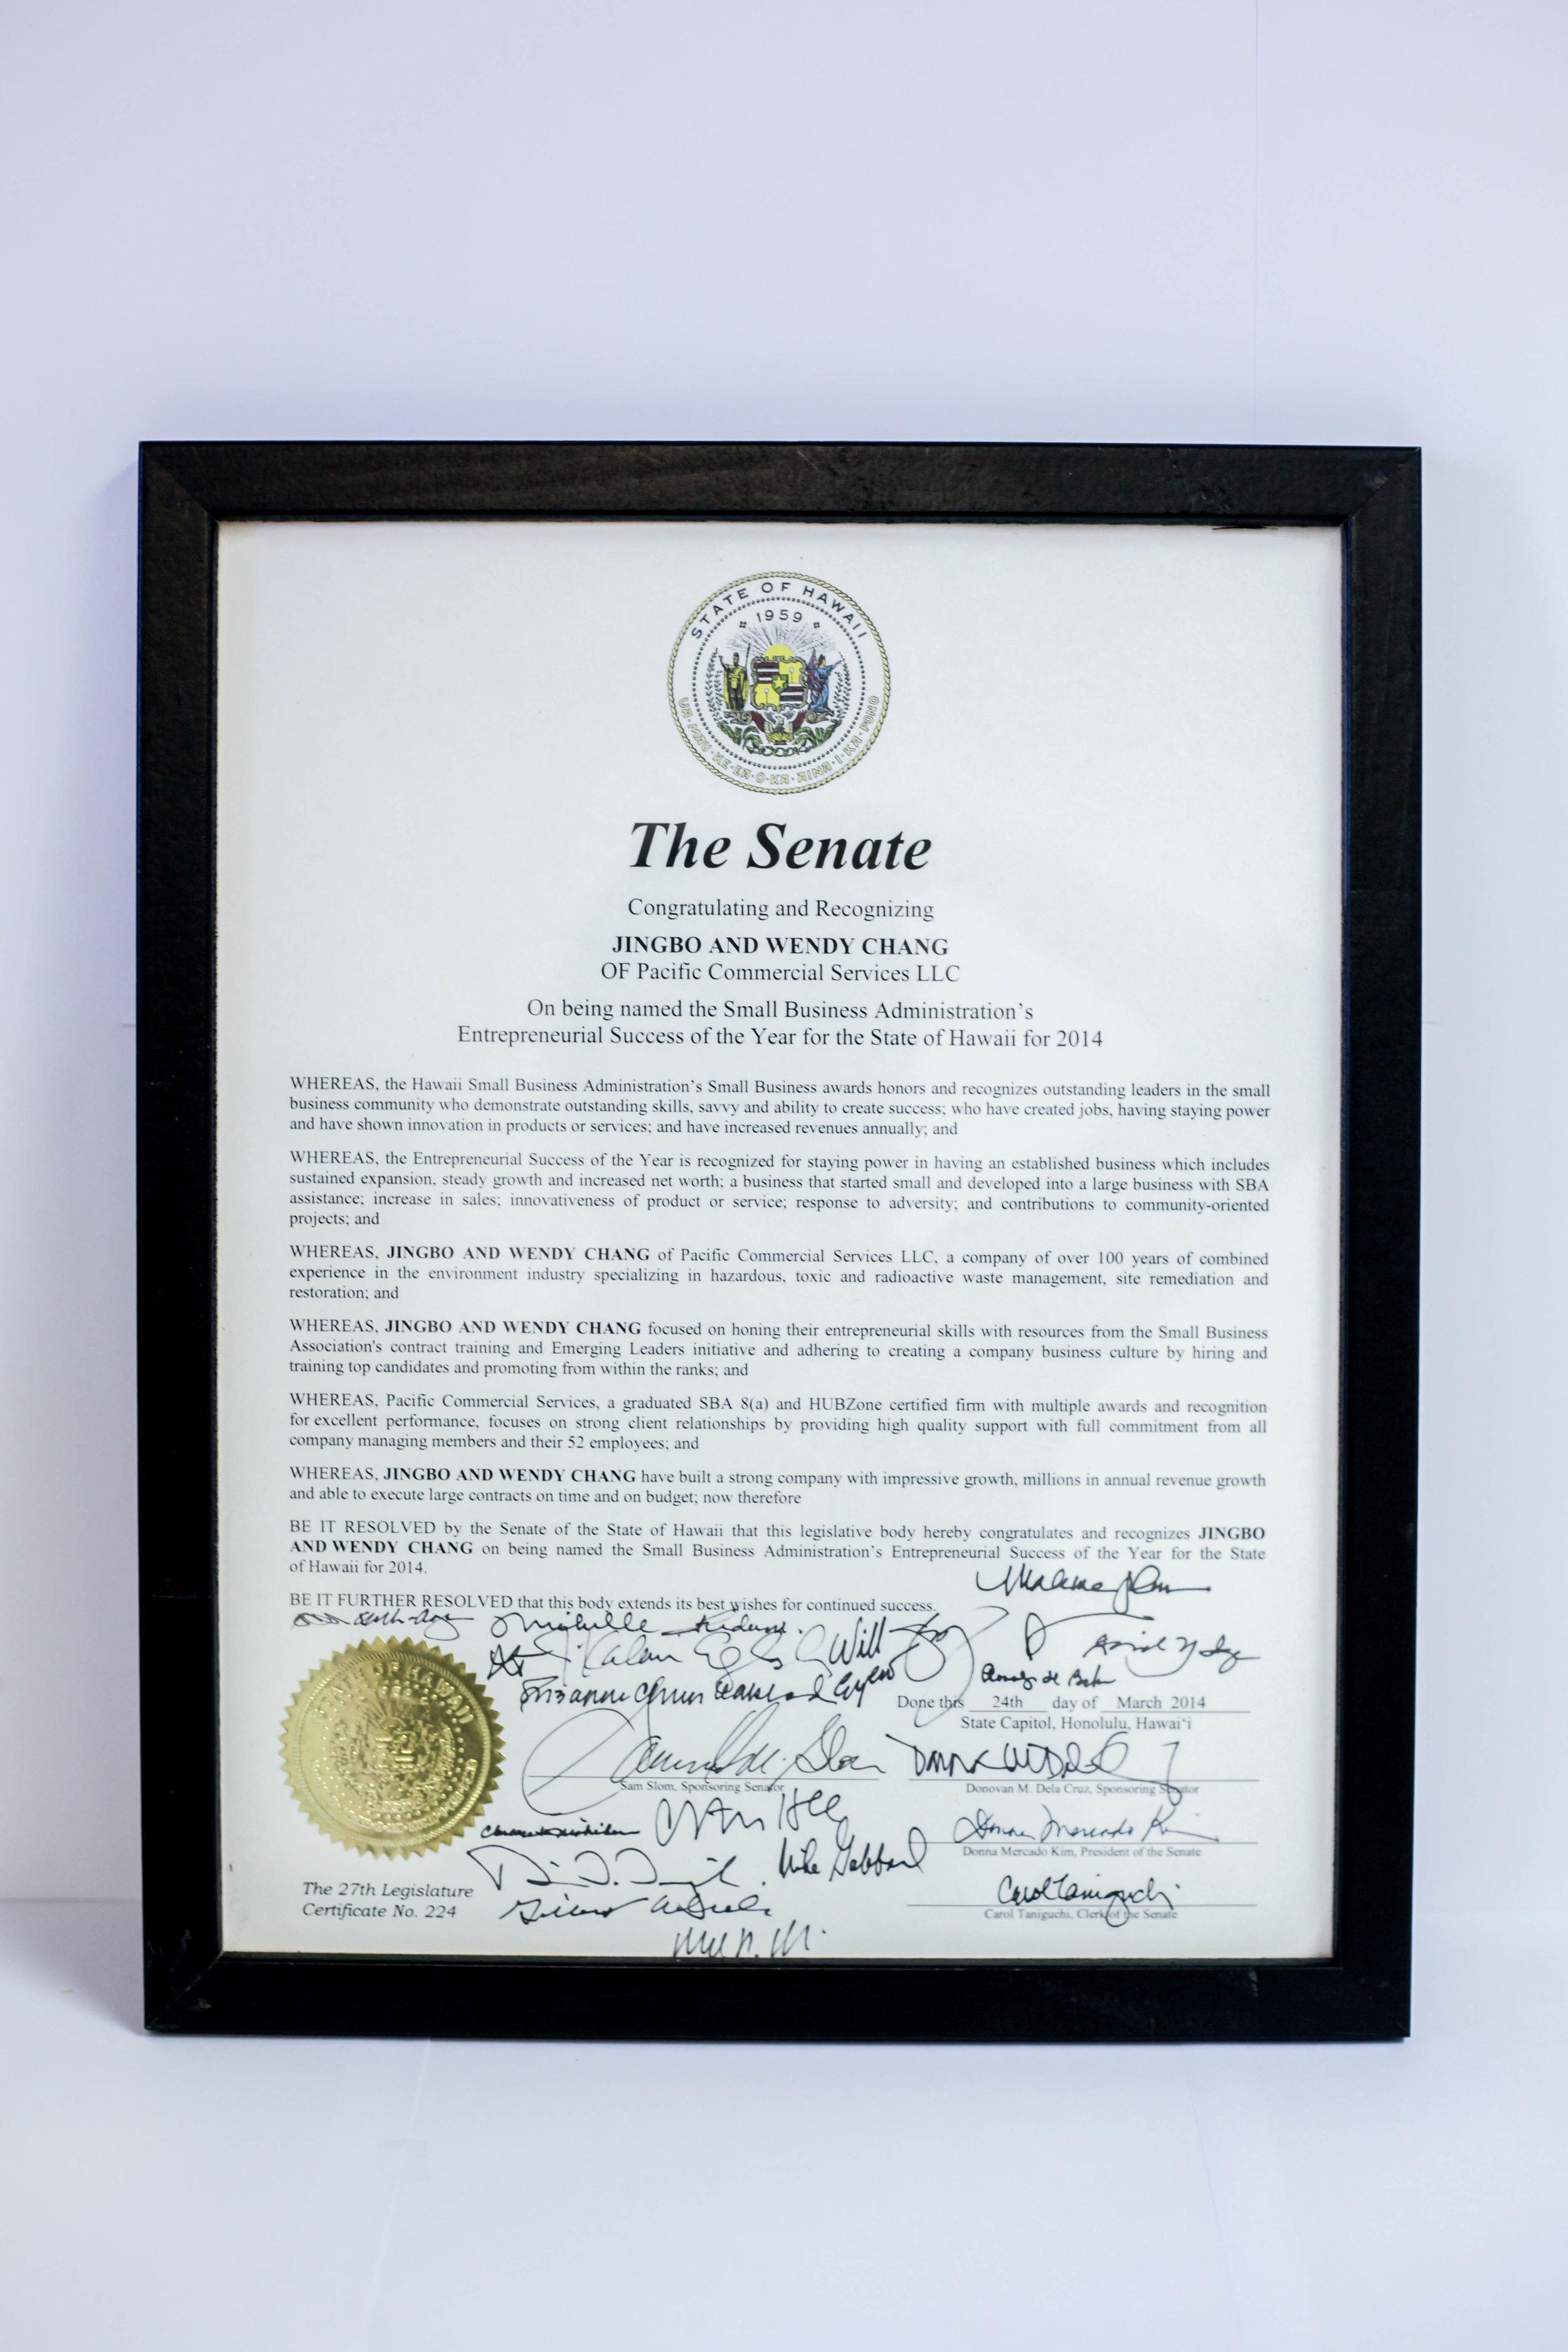 2014 SBA Entrepreneurial Success - Awarded by the Senate